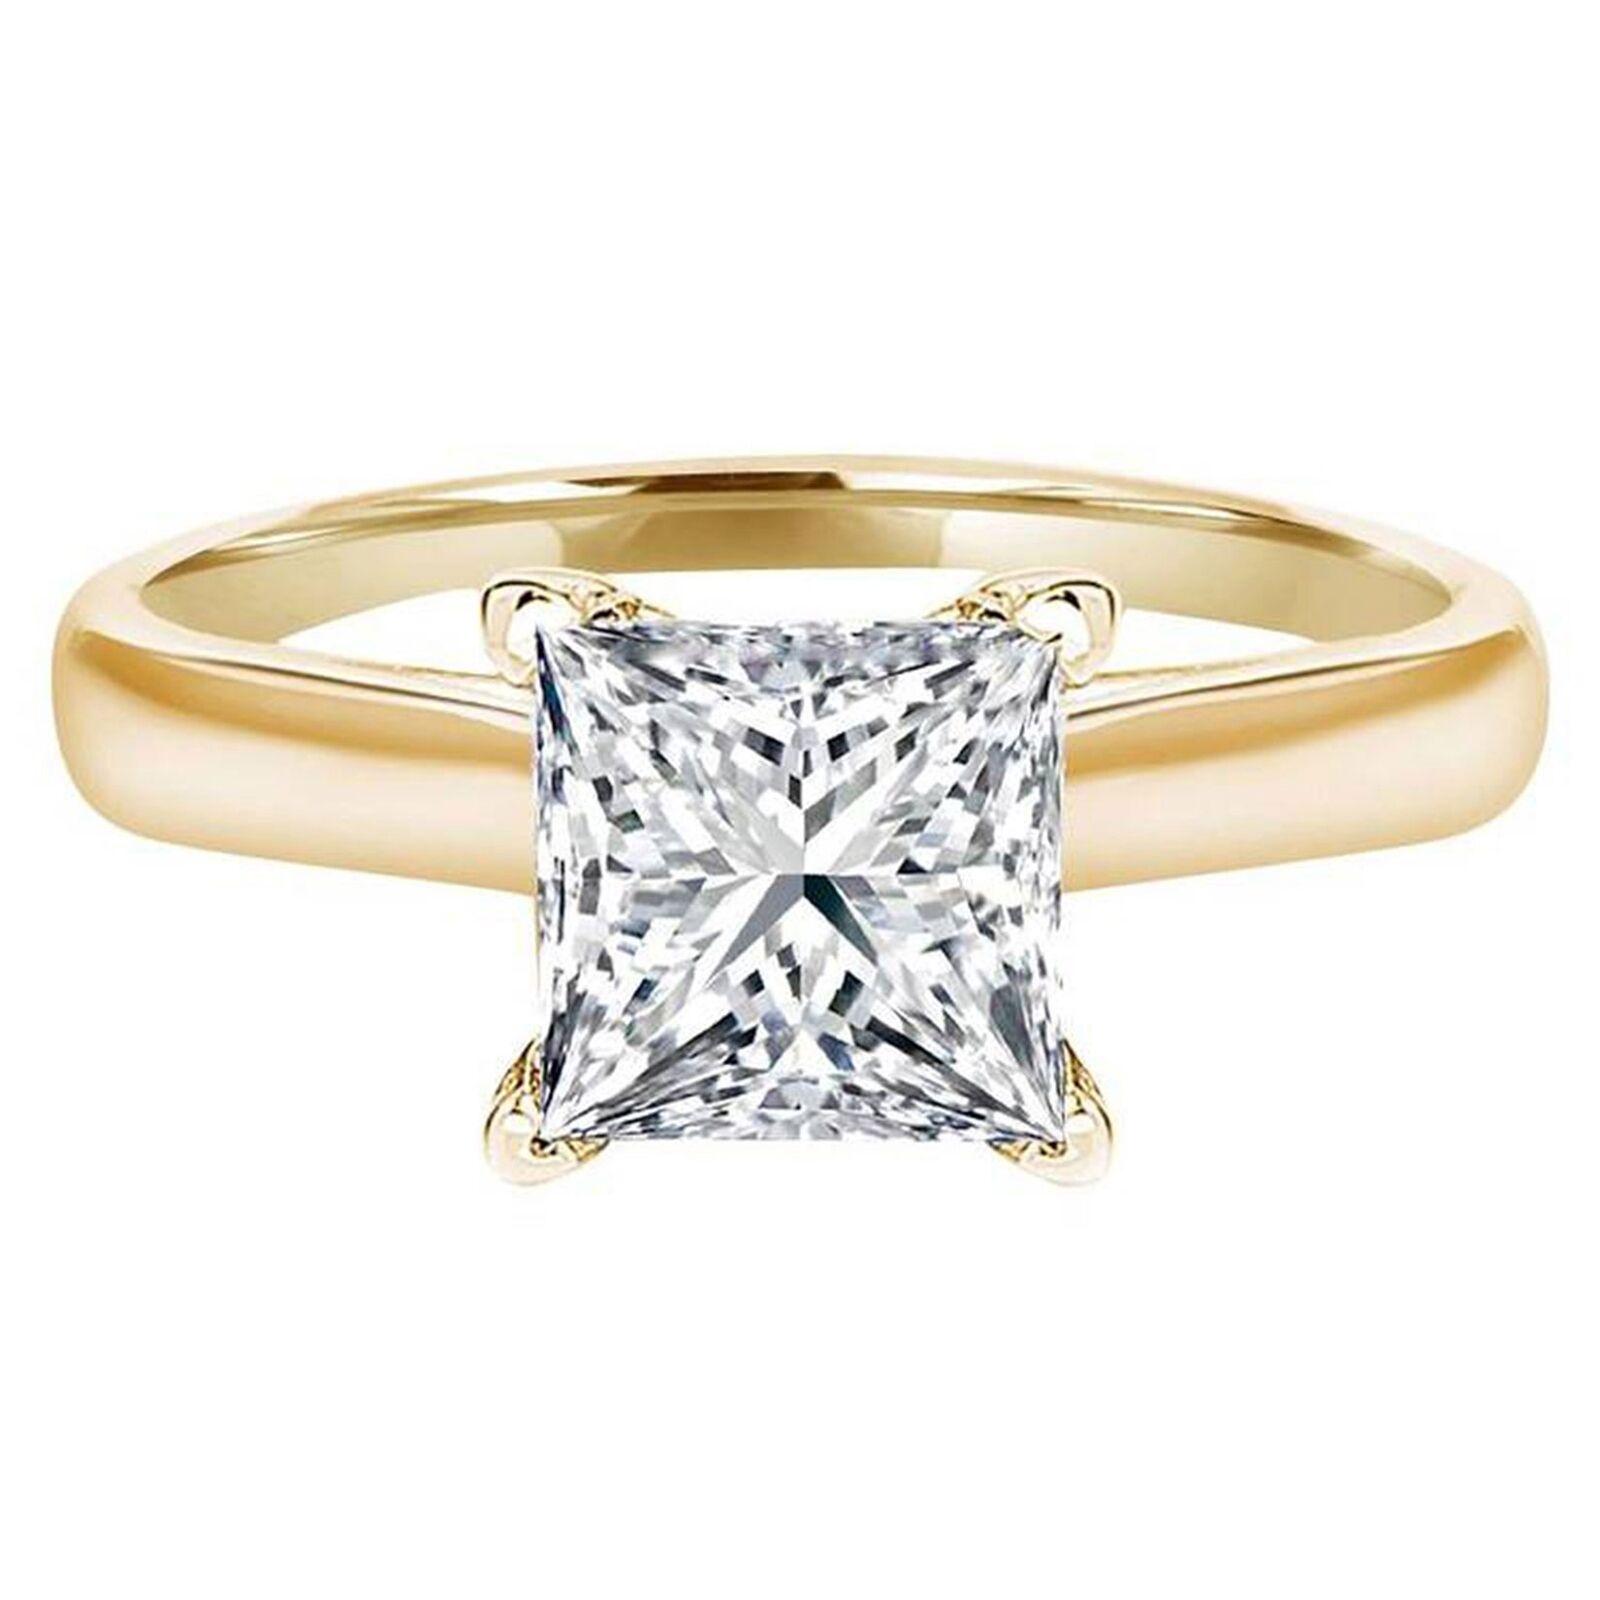 3.1ct Princess Cut Wedding Bridal Engagement Anniversary Ring 14k Yellow gold